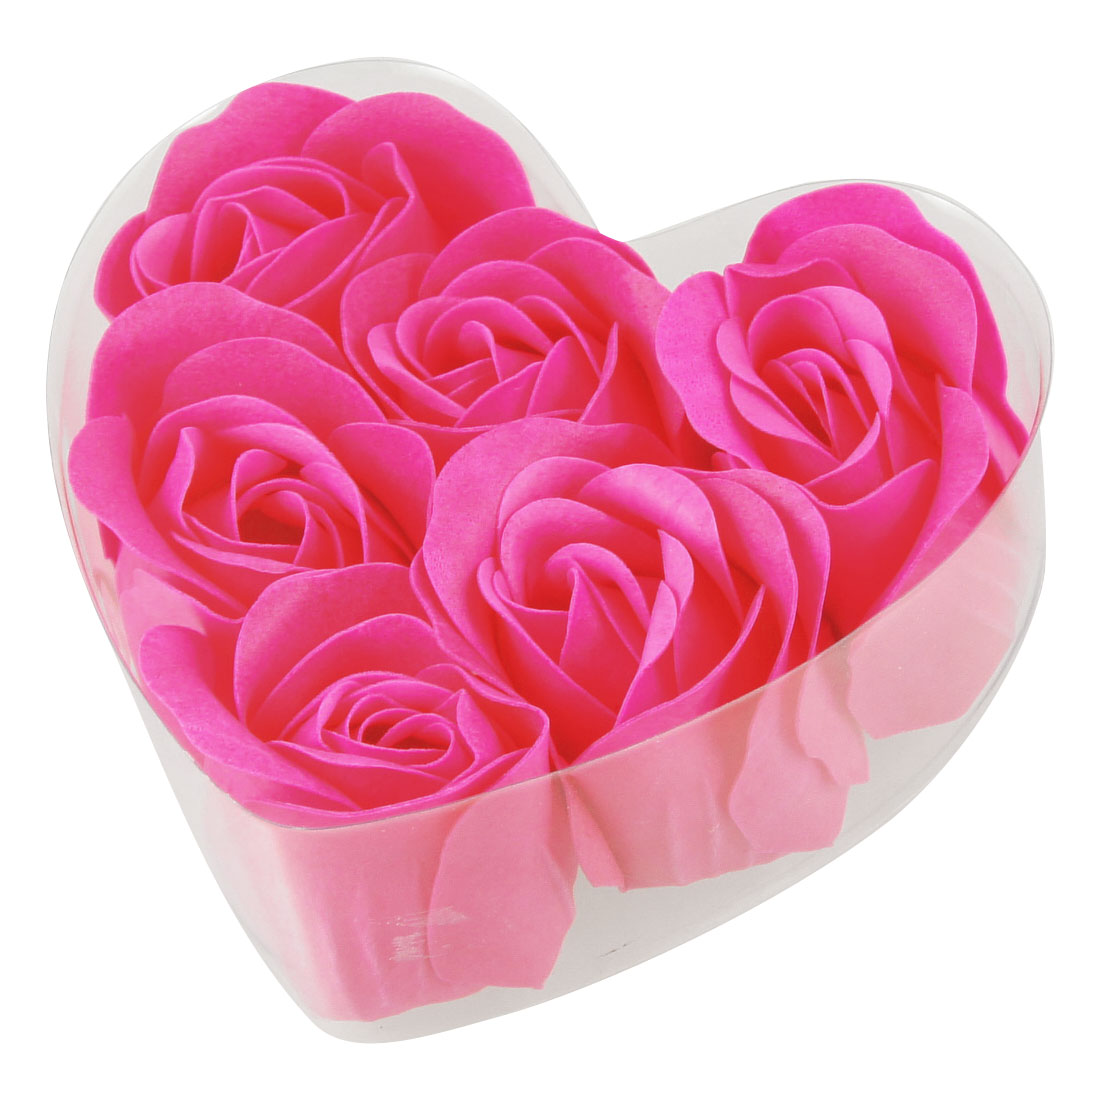 Pink Manmade Fragrant Bath Soap Rose Petals 6 Pieces w Heart Box